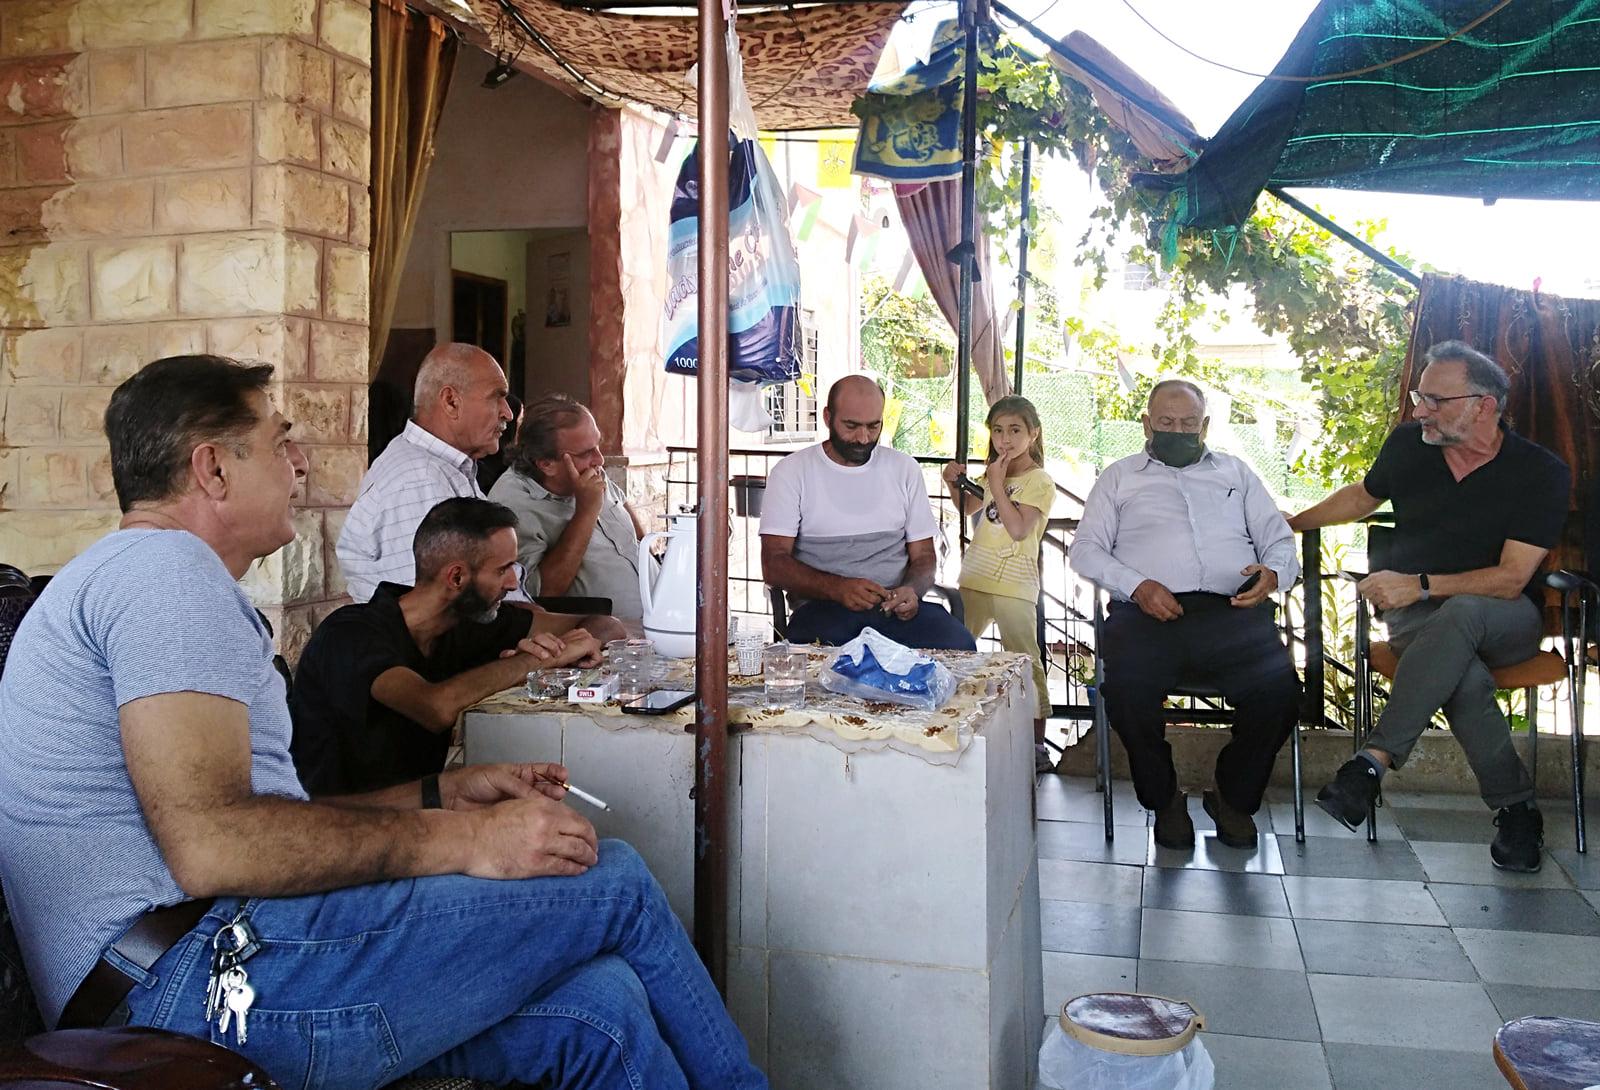 Horror and Hope in Beit Ummar